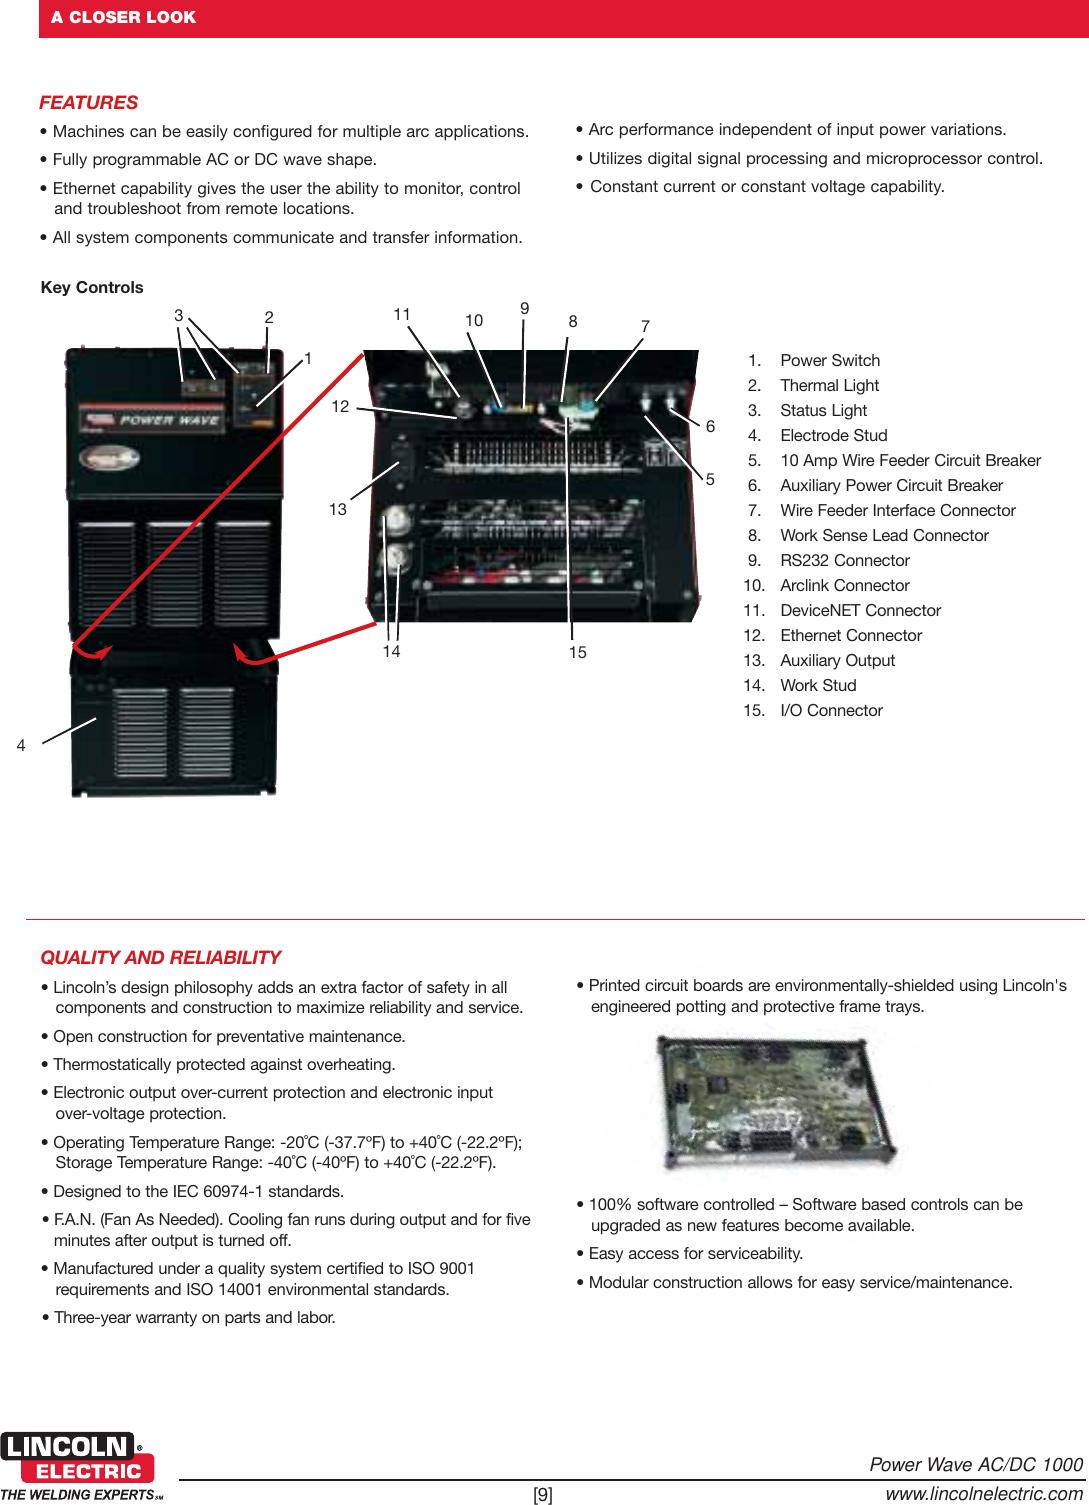 Lincoln Dc 1000 Wiring Diagram Detailed Schematics Amp 2000 Ls 1999 Club Car And Navigator Engine